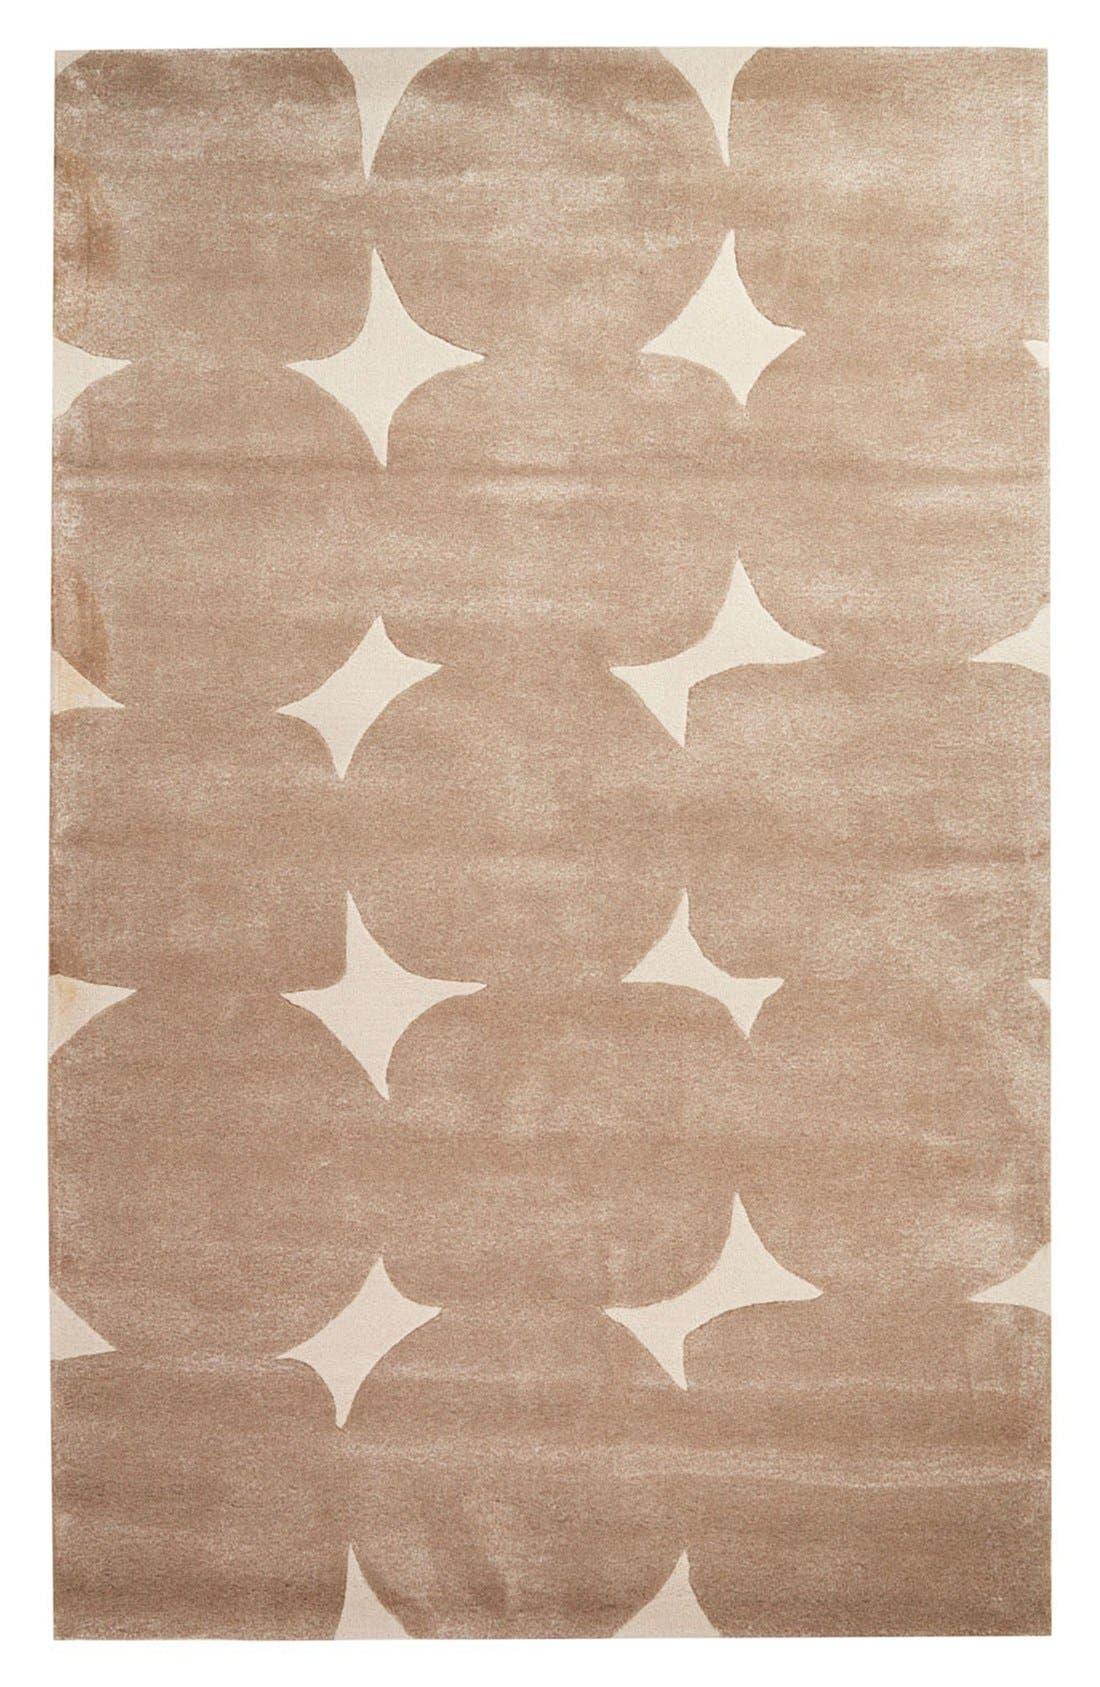 Alternate Image 1 Selected - kate spade new york 'gramercy' dot wool & silk rug